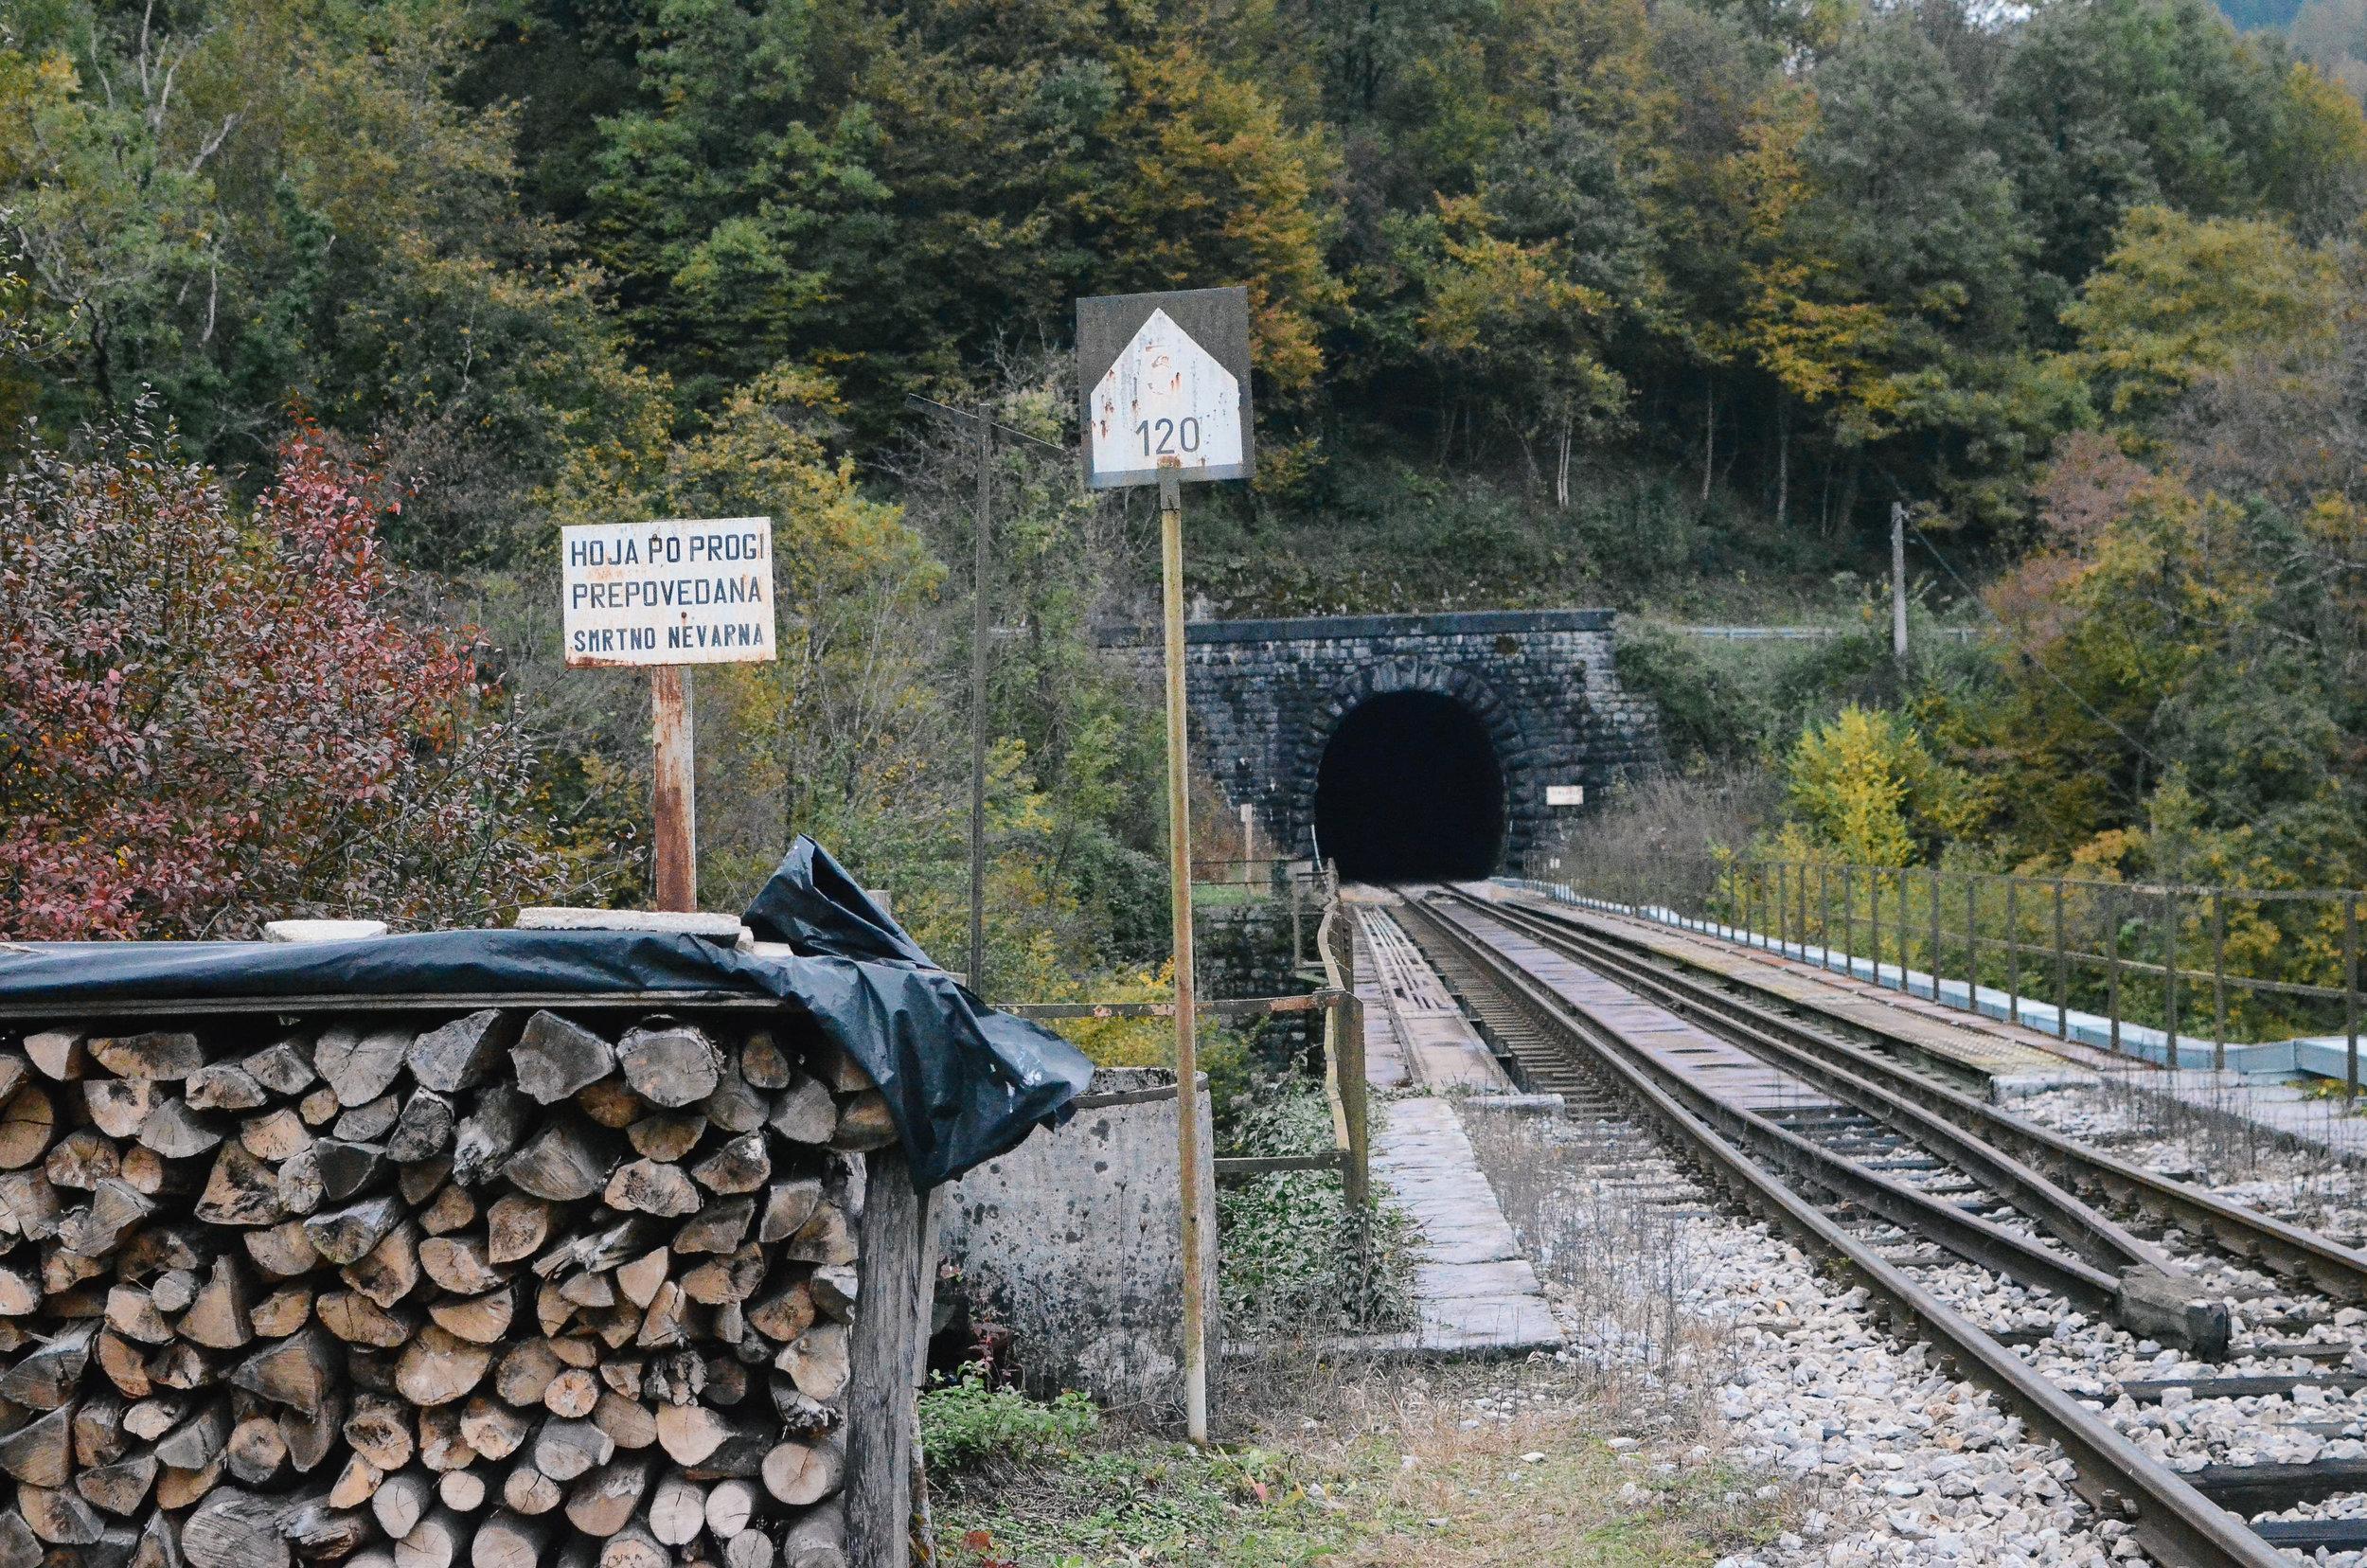 wwoofing-slovenia-klavze28-most-na-soci_DSC_0305.jpg